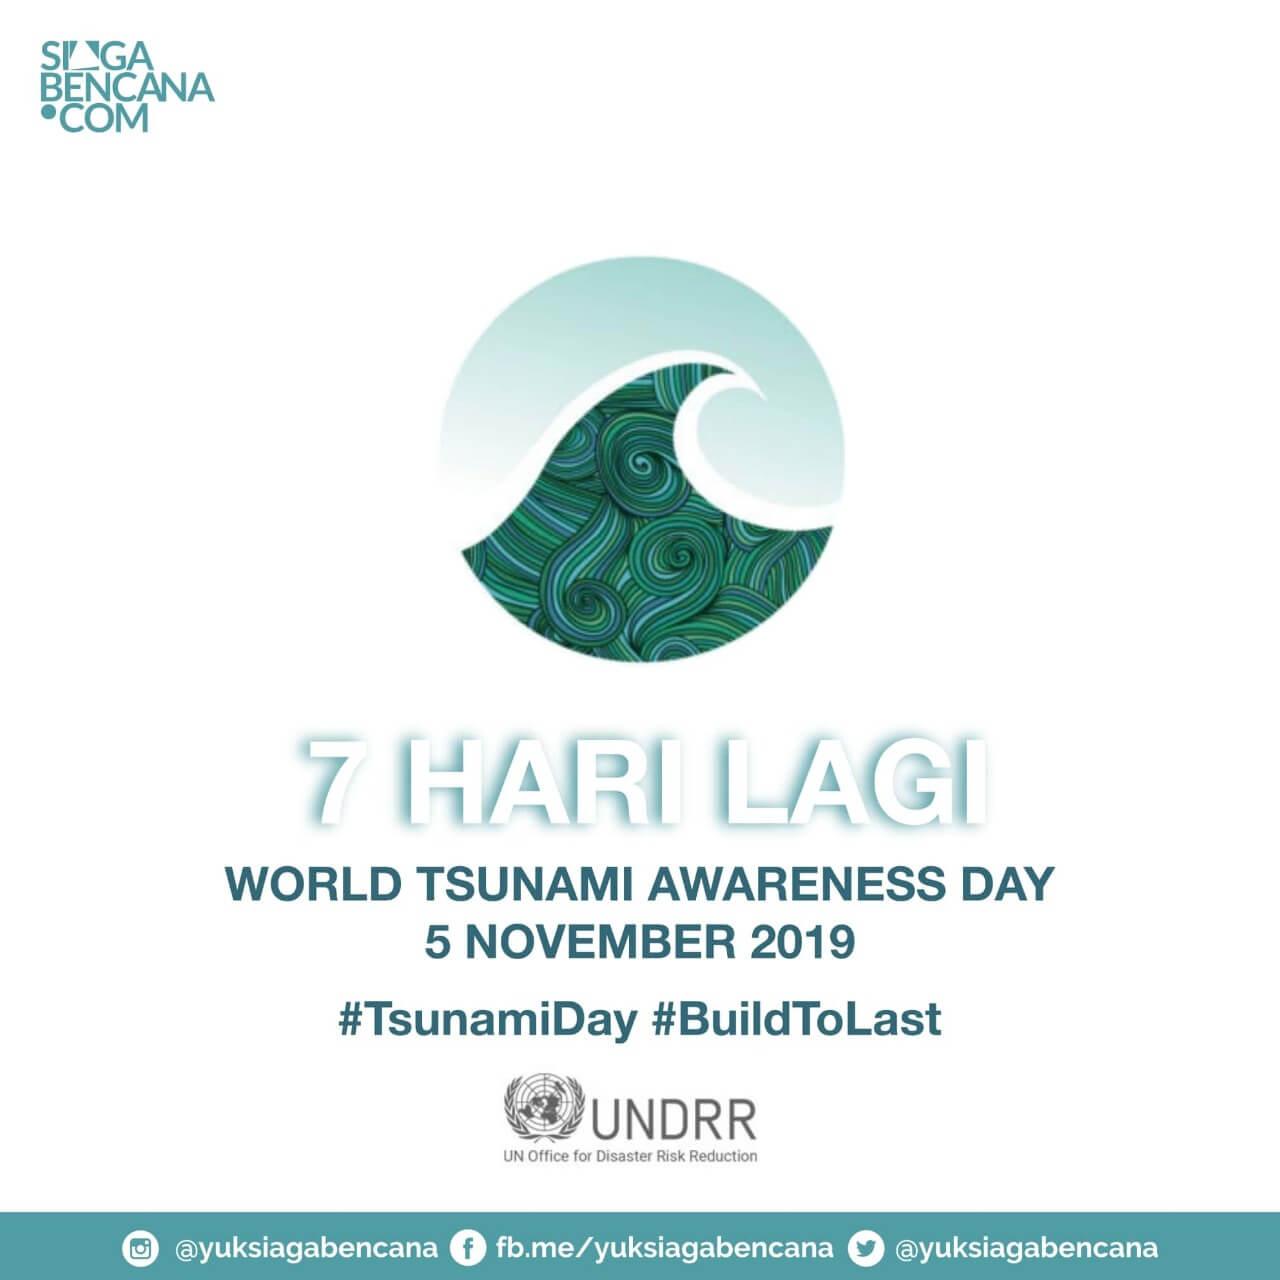 Sambut The World Tsunami Awareness Day, Nyok